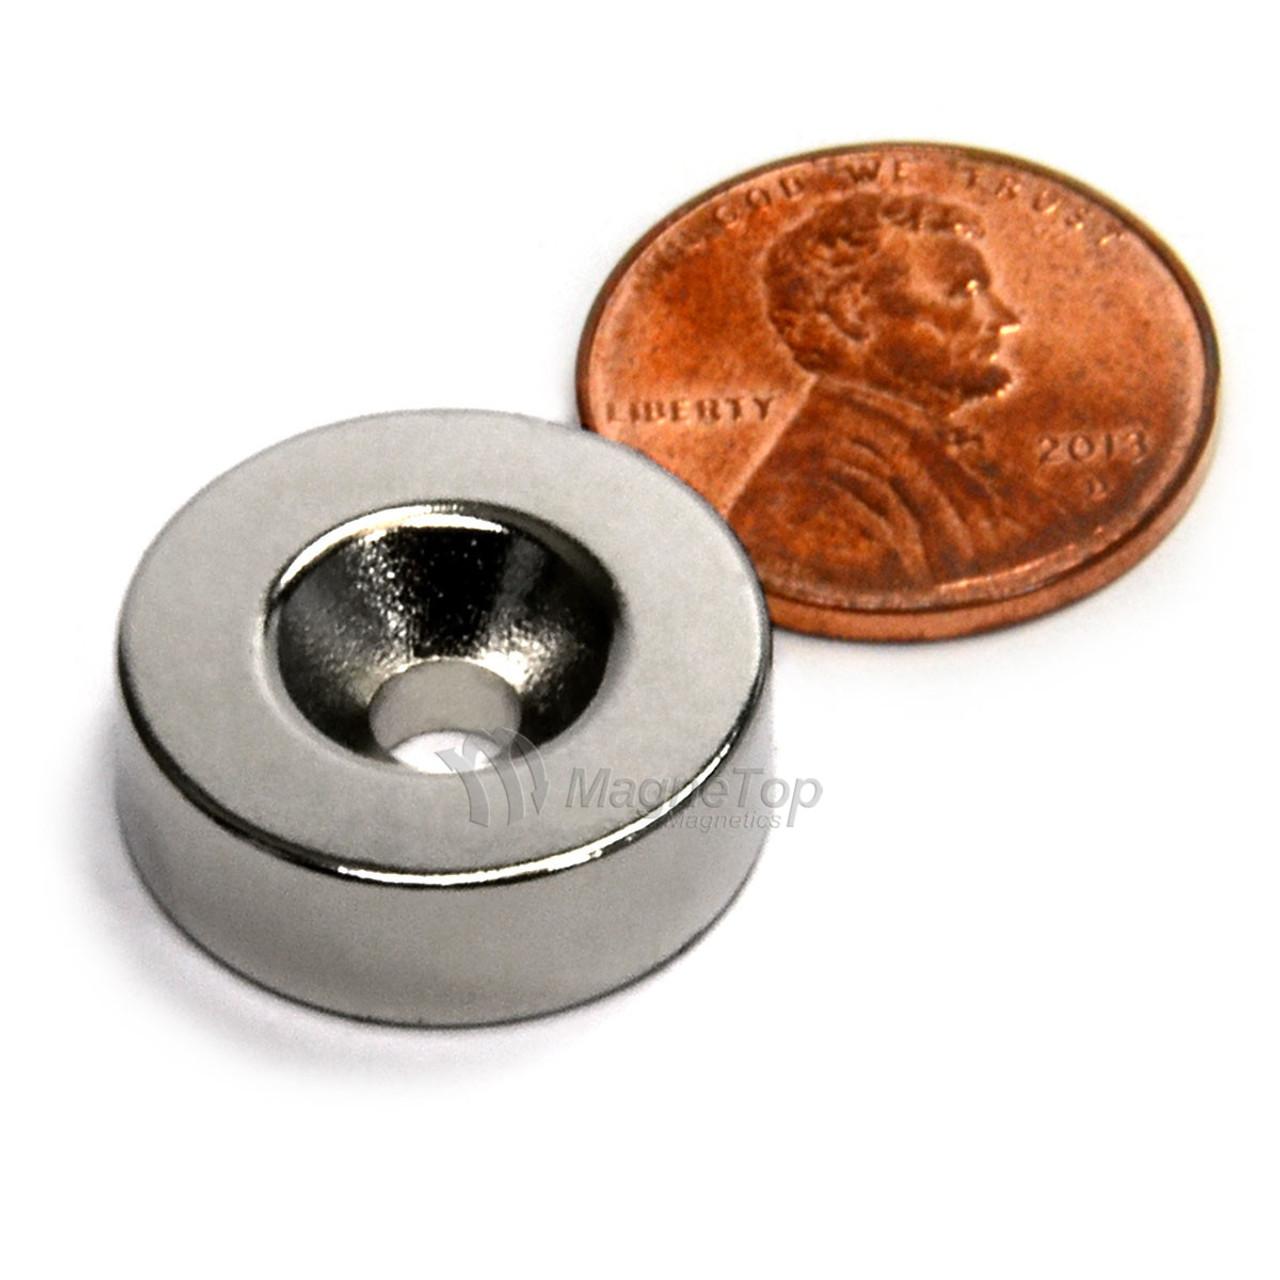 19.1mm x 6.4mm-N52-M5 Countersink on One Side | Neodymium Round Countersunk